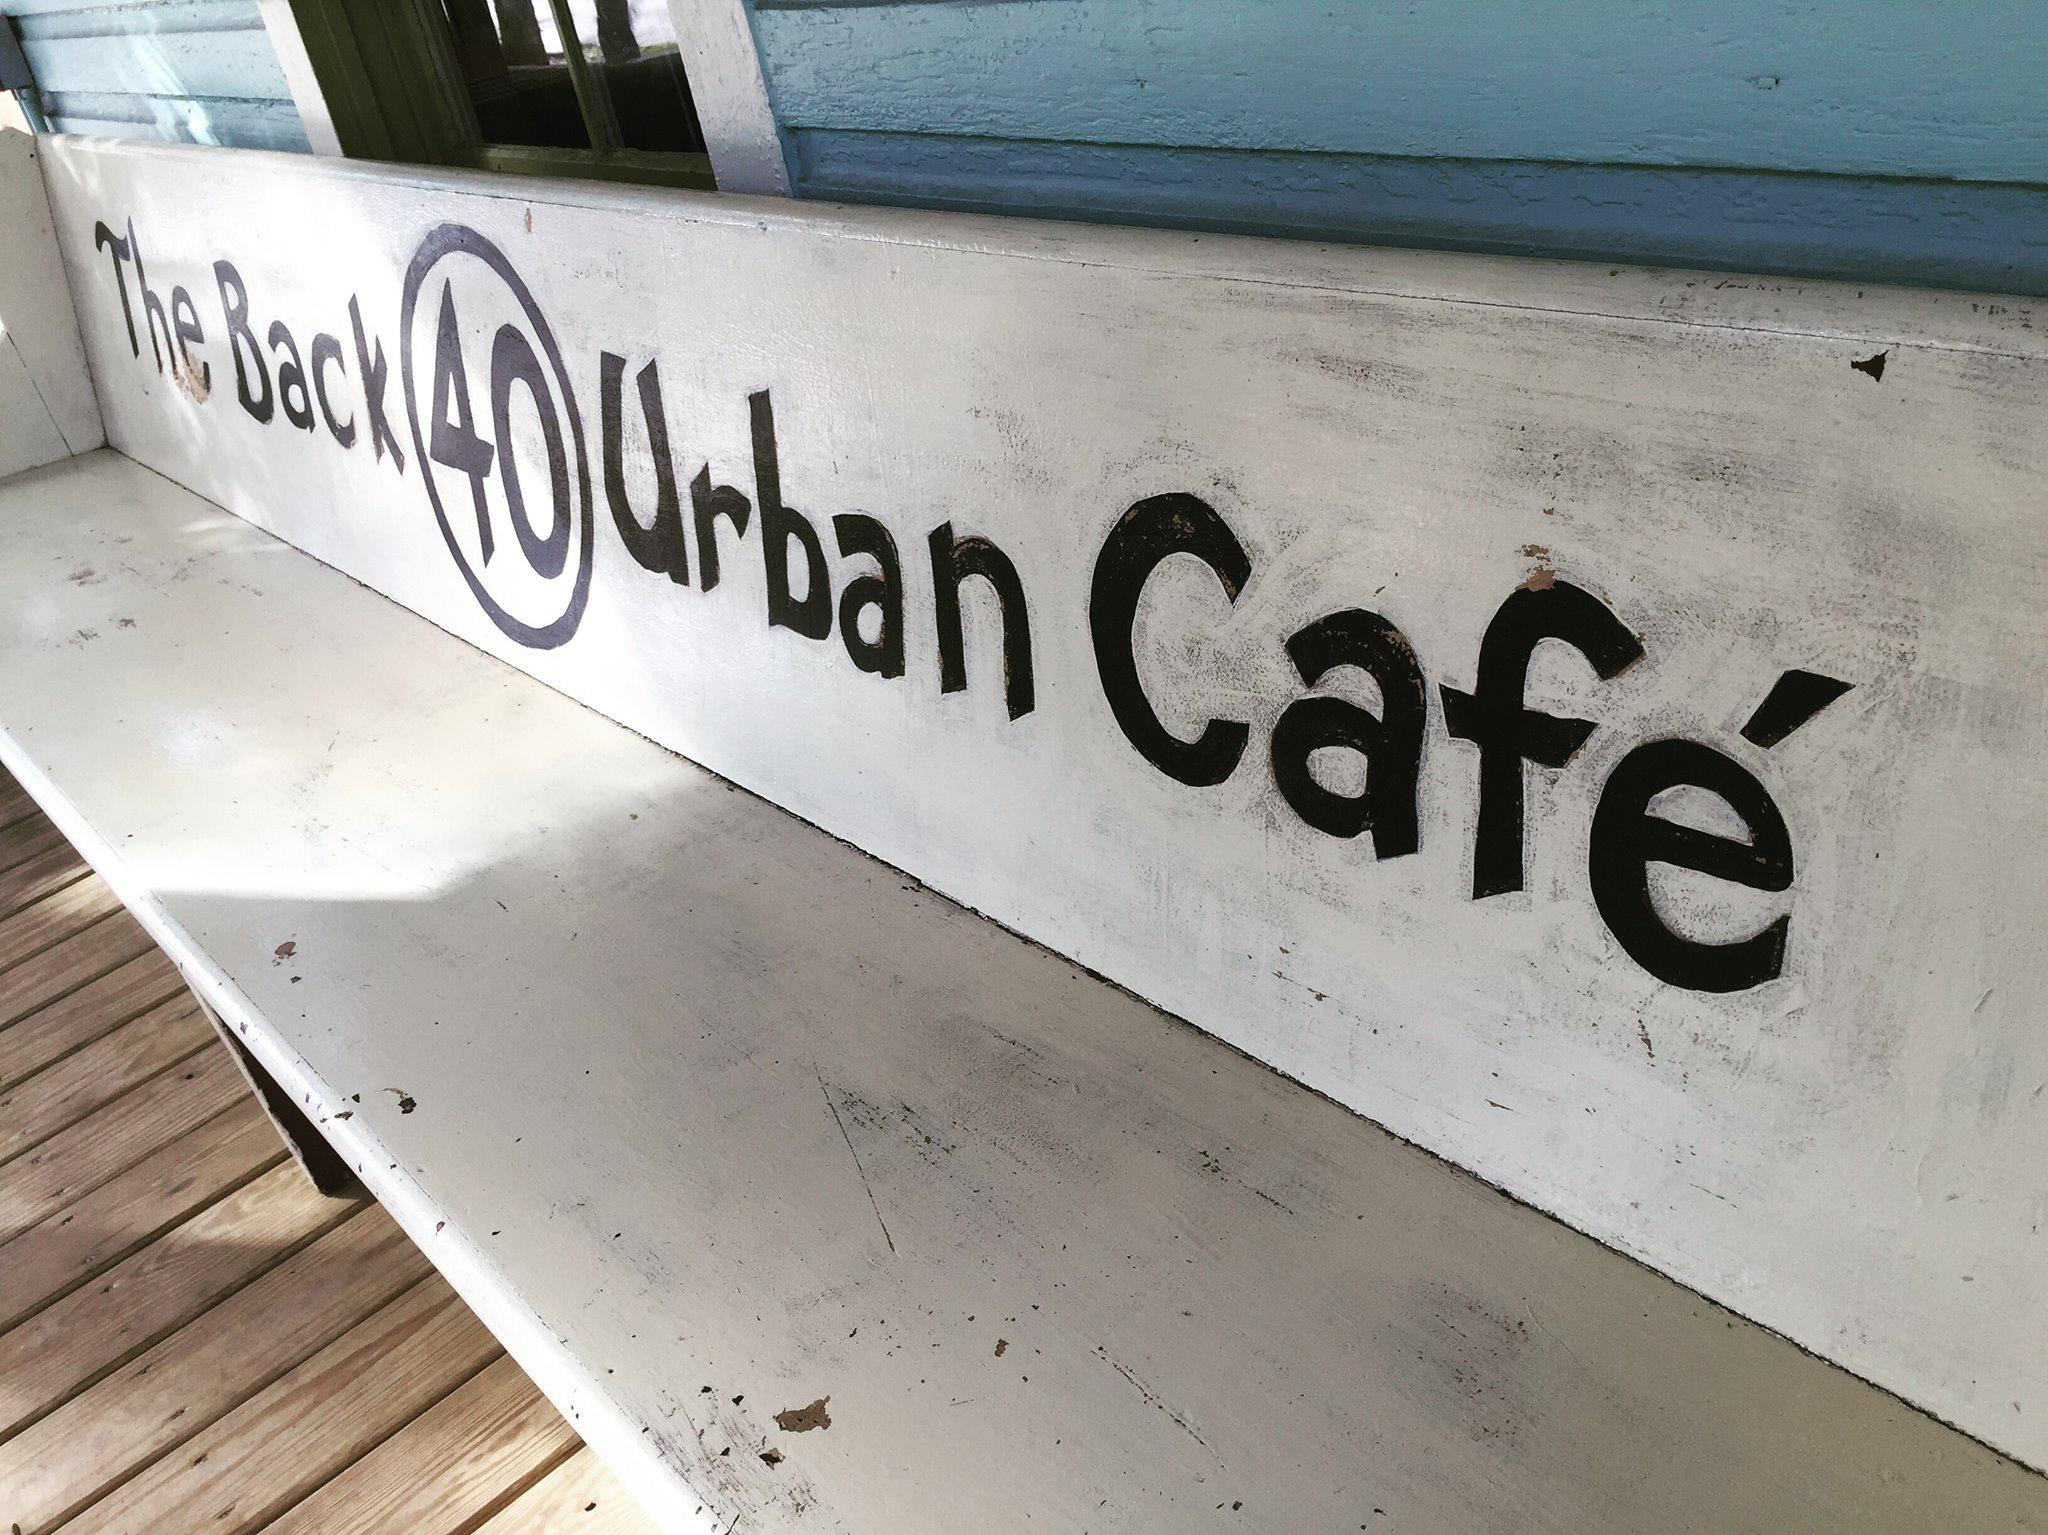 Back 40 Urban Cafe